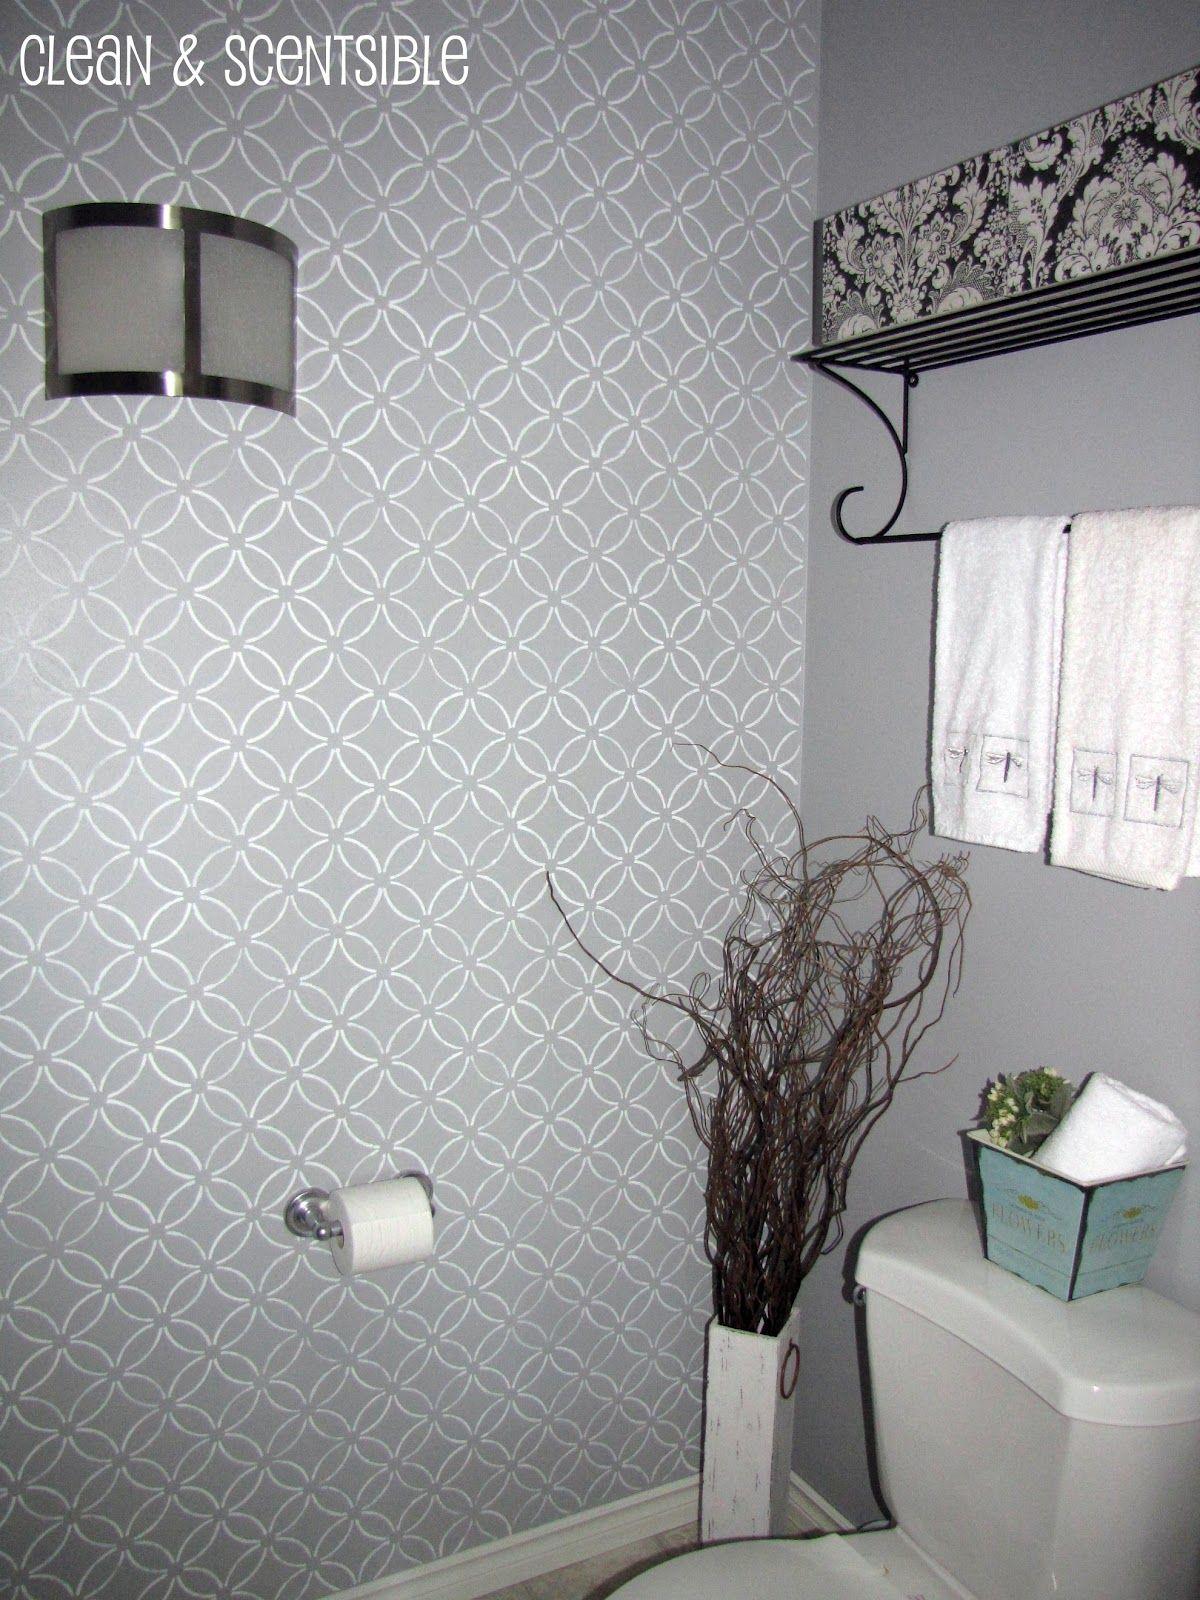 Stenciled Bathroom Wall and the Cutting Edge Stencil ...